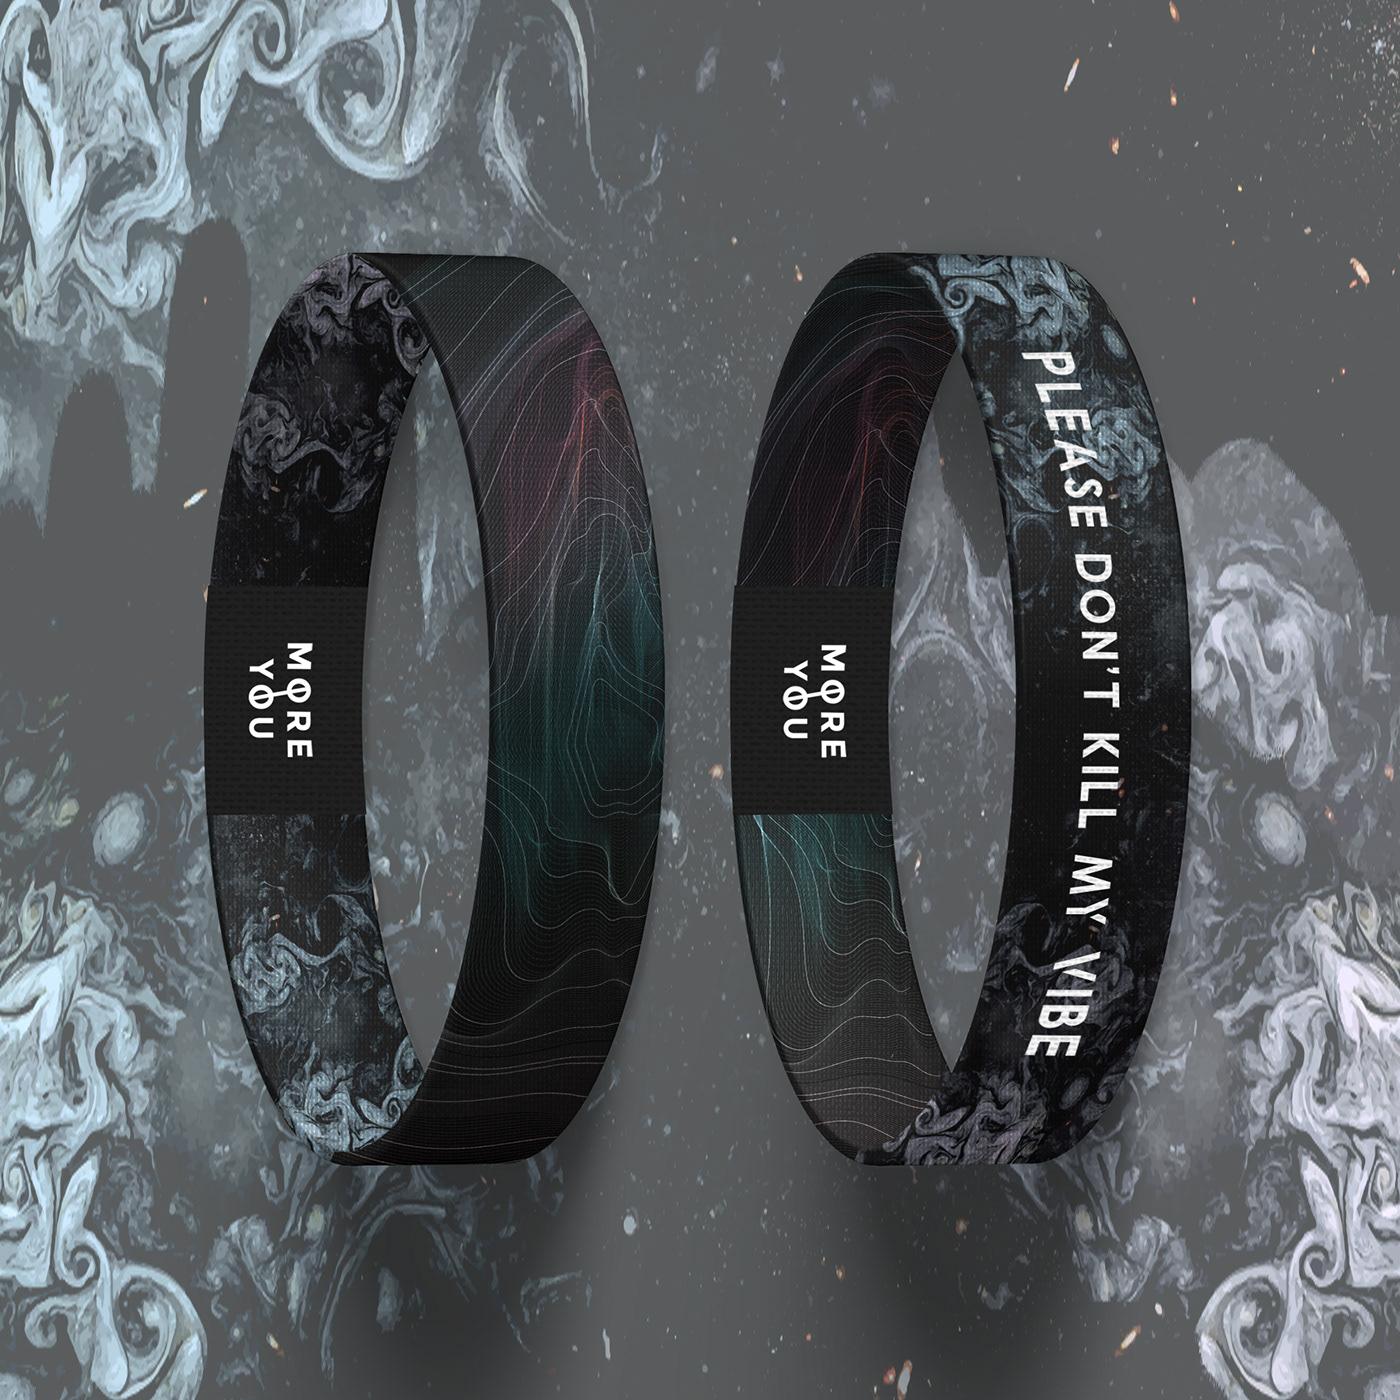 accessories bracelets Graphicdesign logo logo mock up